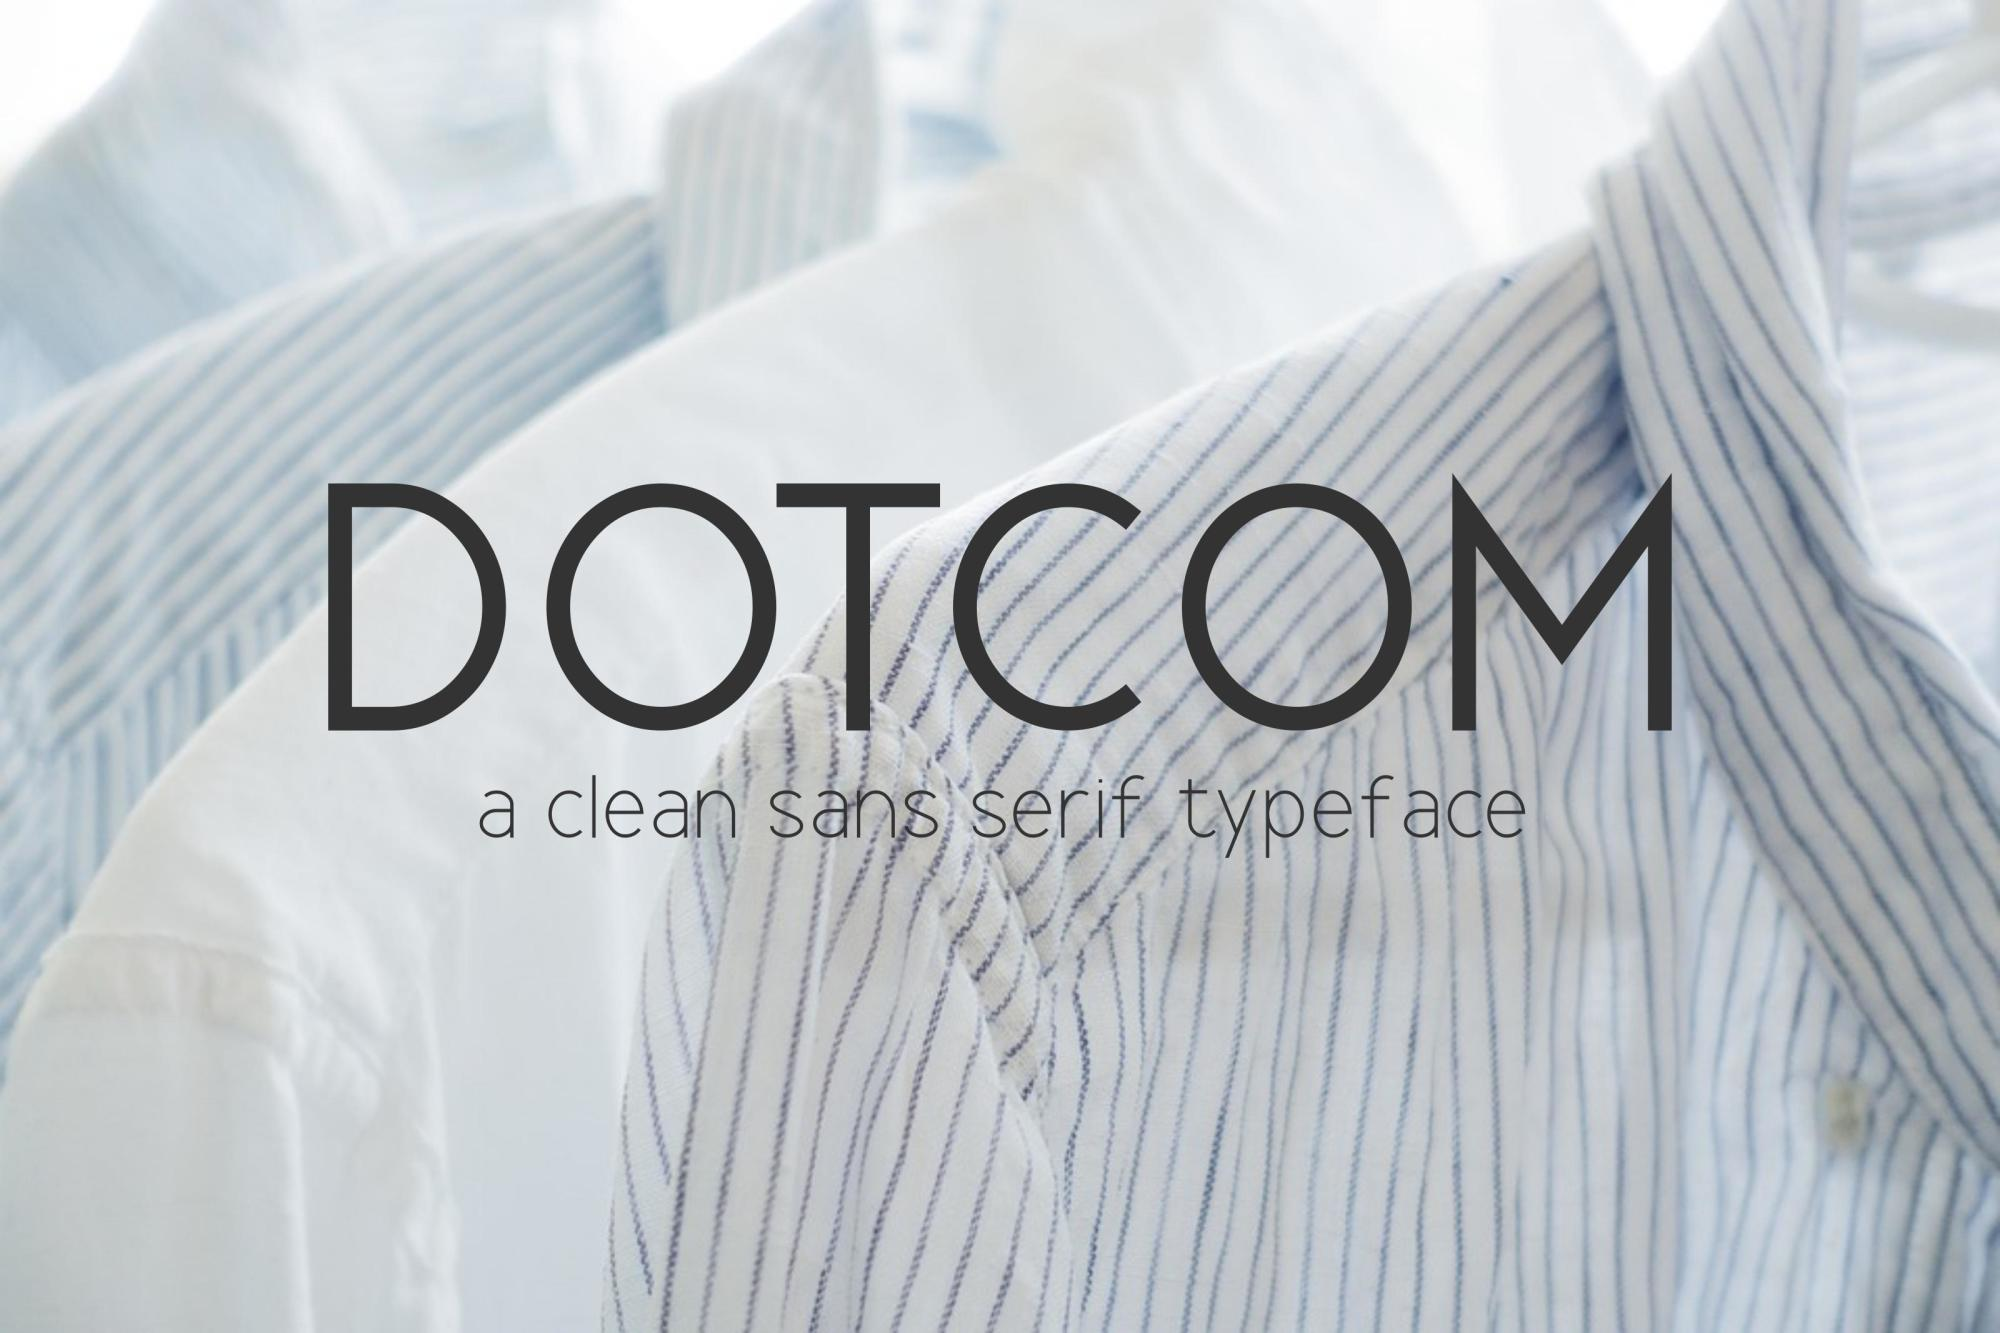 Dotcom Family example image 1